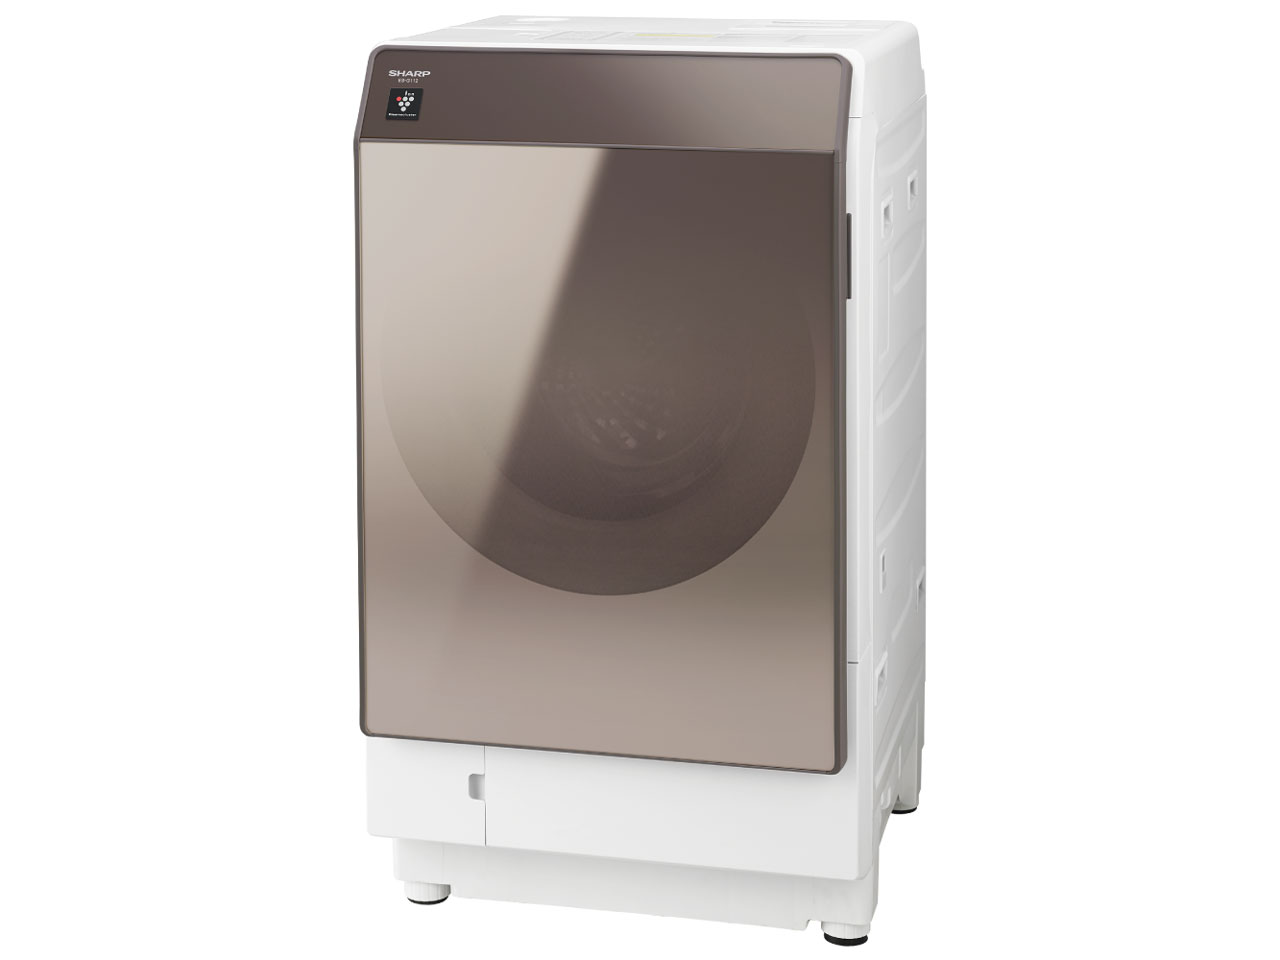 ES-G112-TL シャープ ドラム洗濯乾燥機